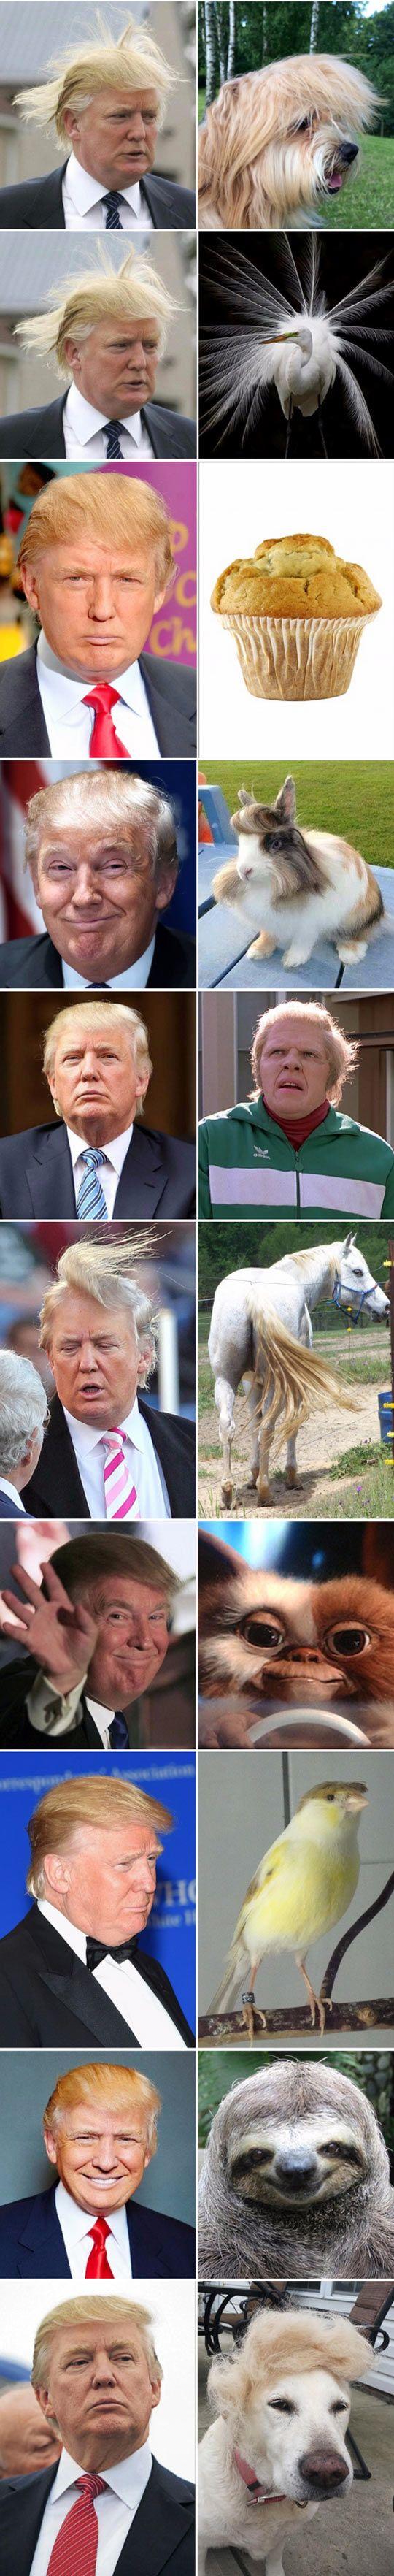 #HRHnadbook Donald Trump hair